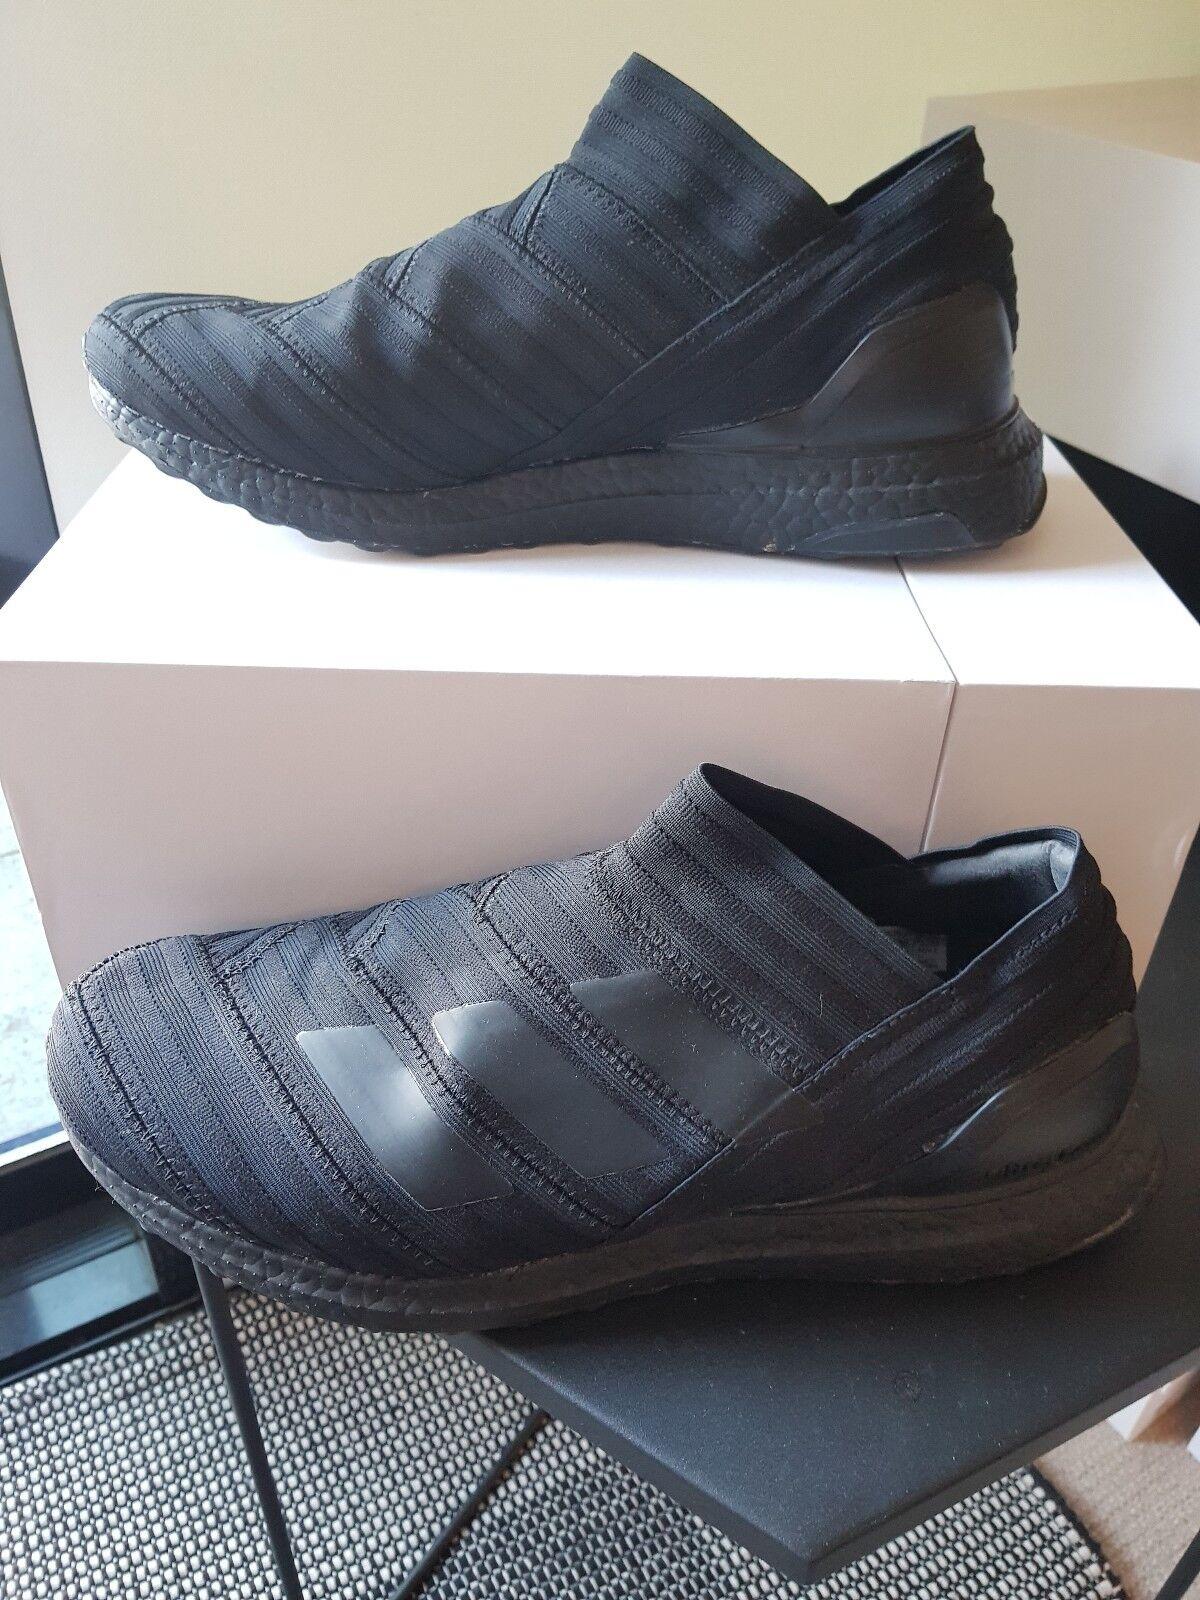 Adidas Nemeziz Tango 17+ Ultra Boost, Triple nero, 11.5US, Near New